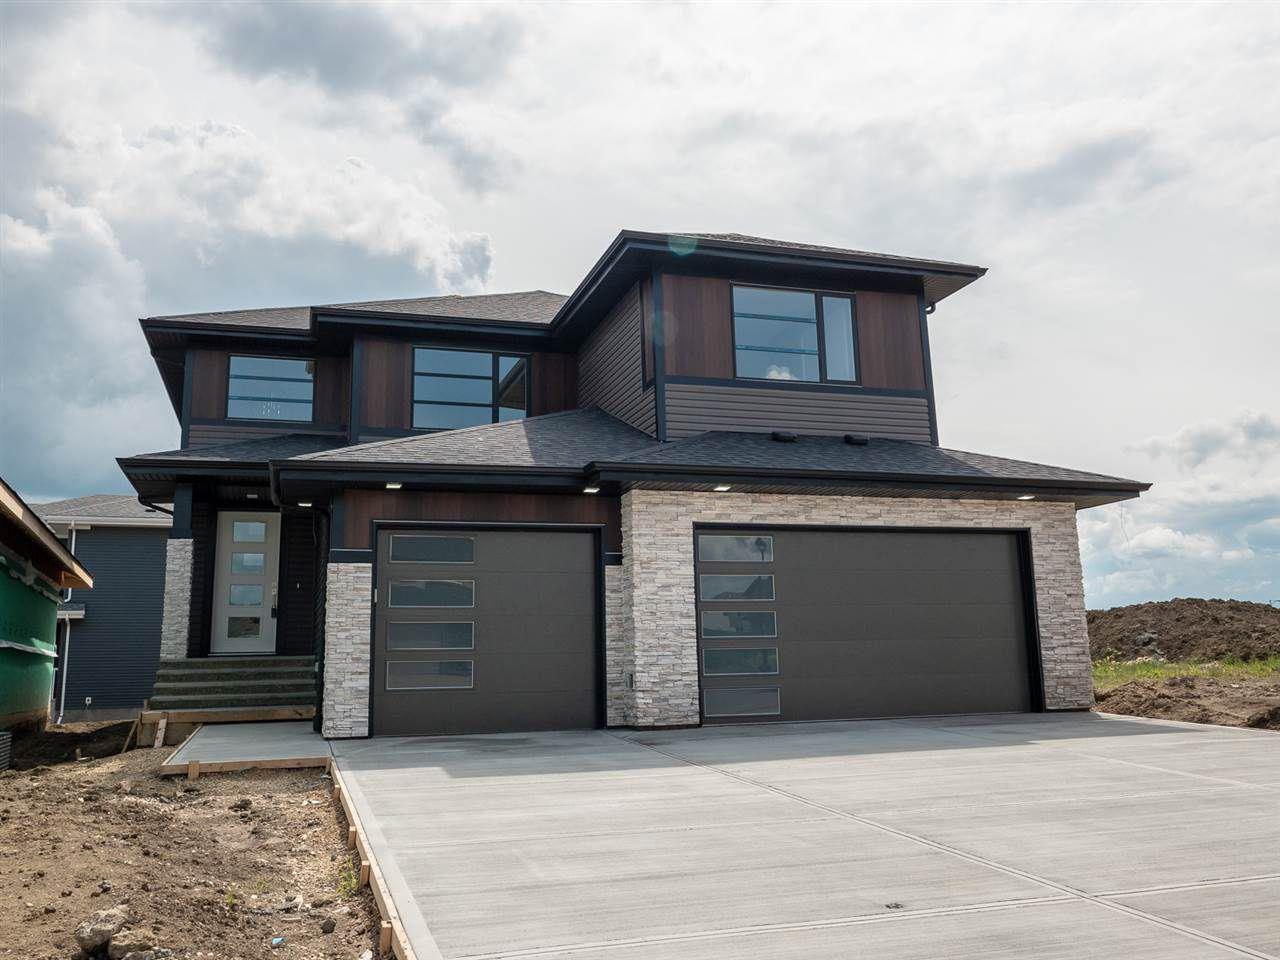 Main Photo: 9432 206 Street in Edmonton: Zone 58 House for sale : MLS®# E4151473